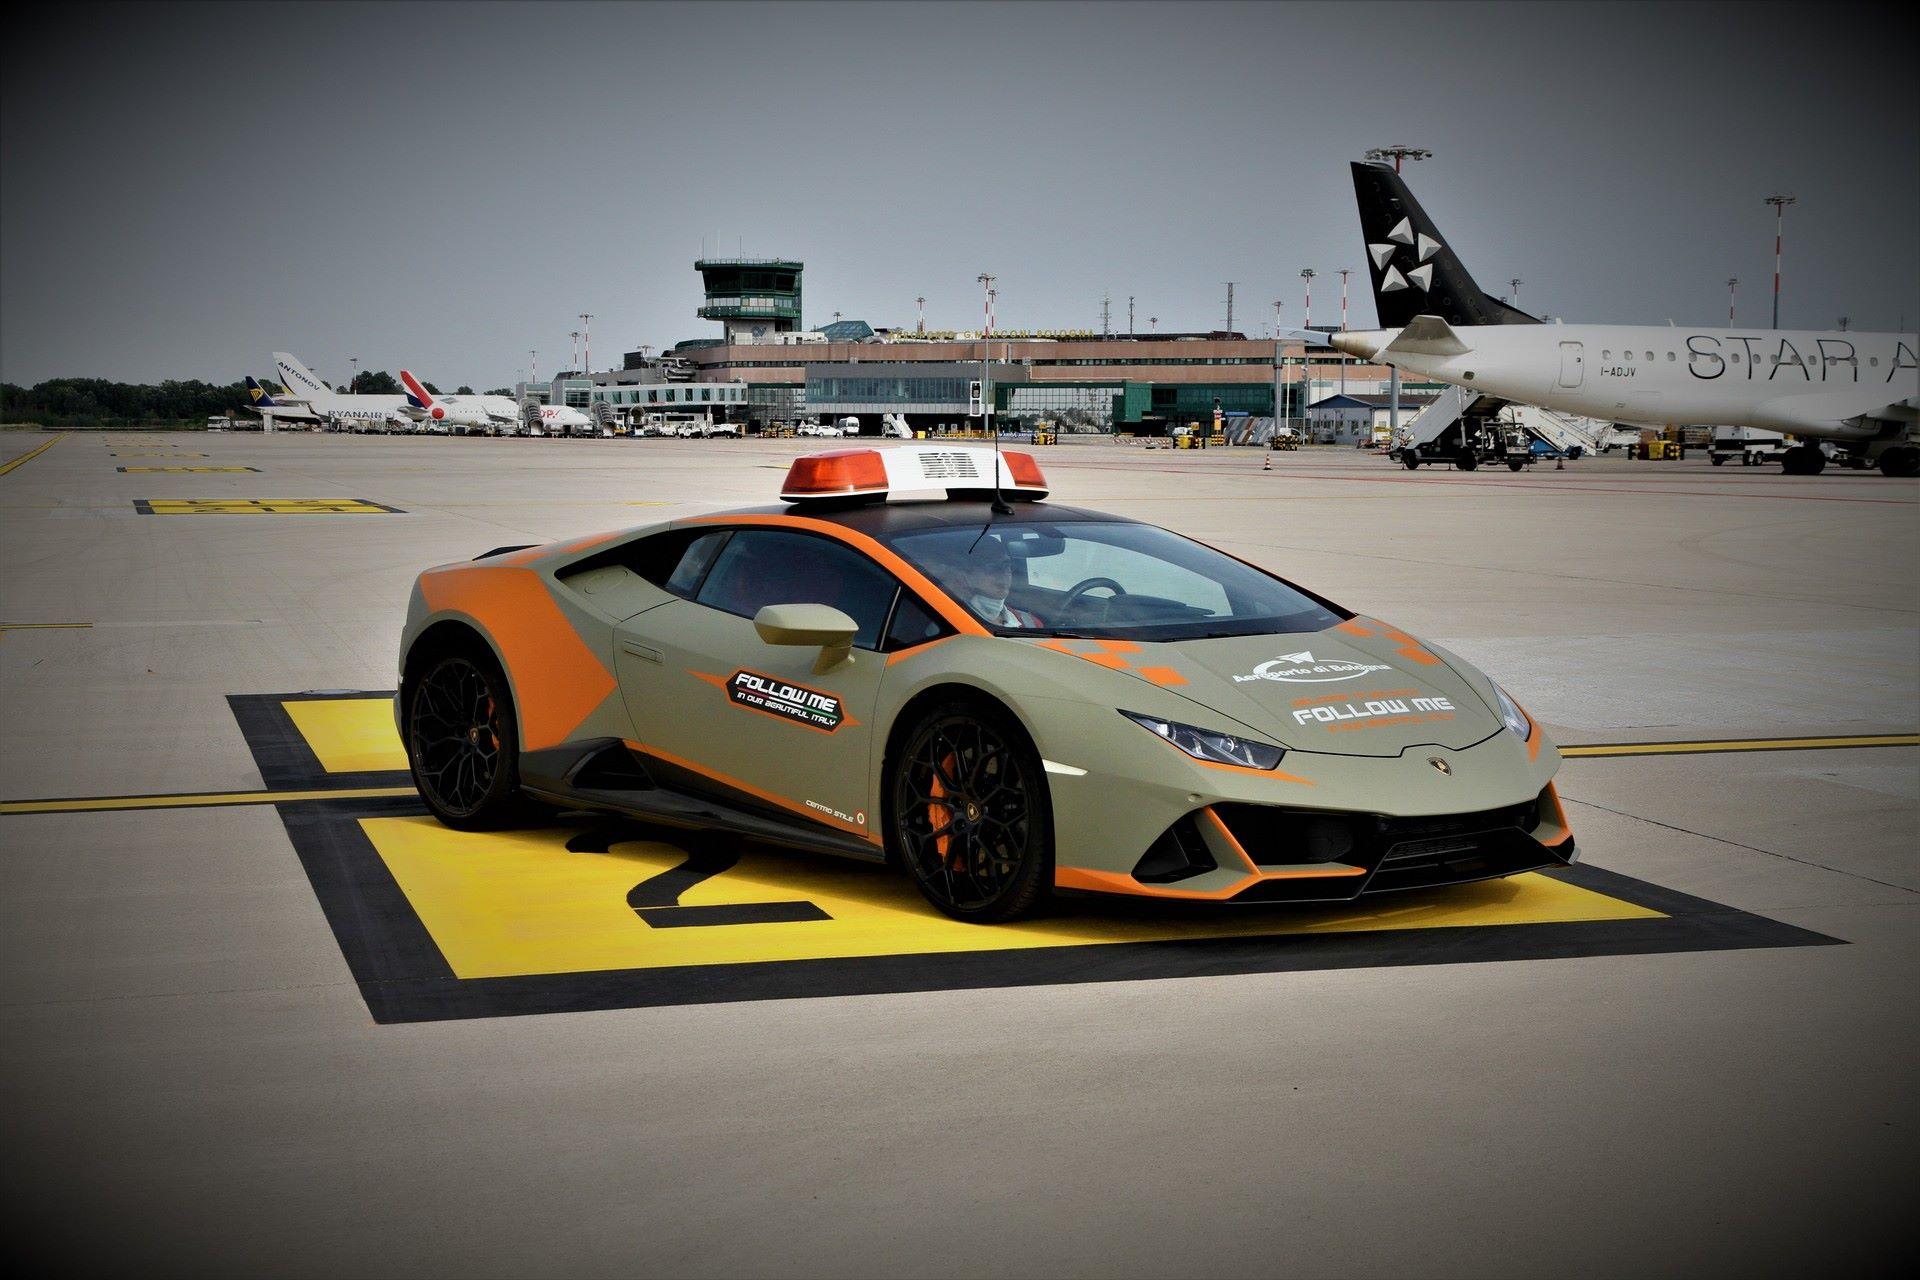 Lamborghini-Huracan-Evo-Follow-Me-bologna-airport-2021-8